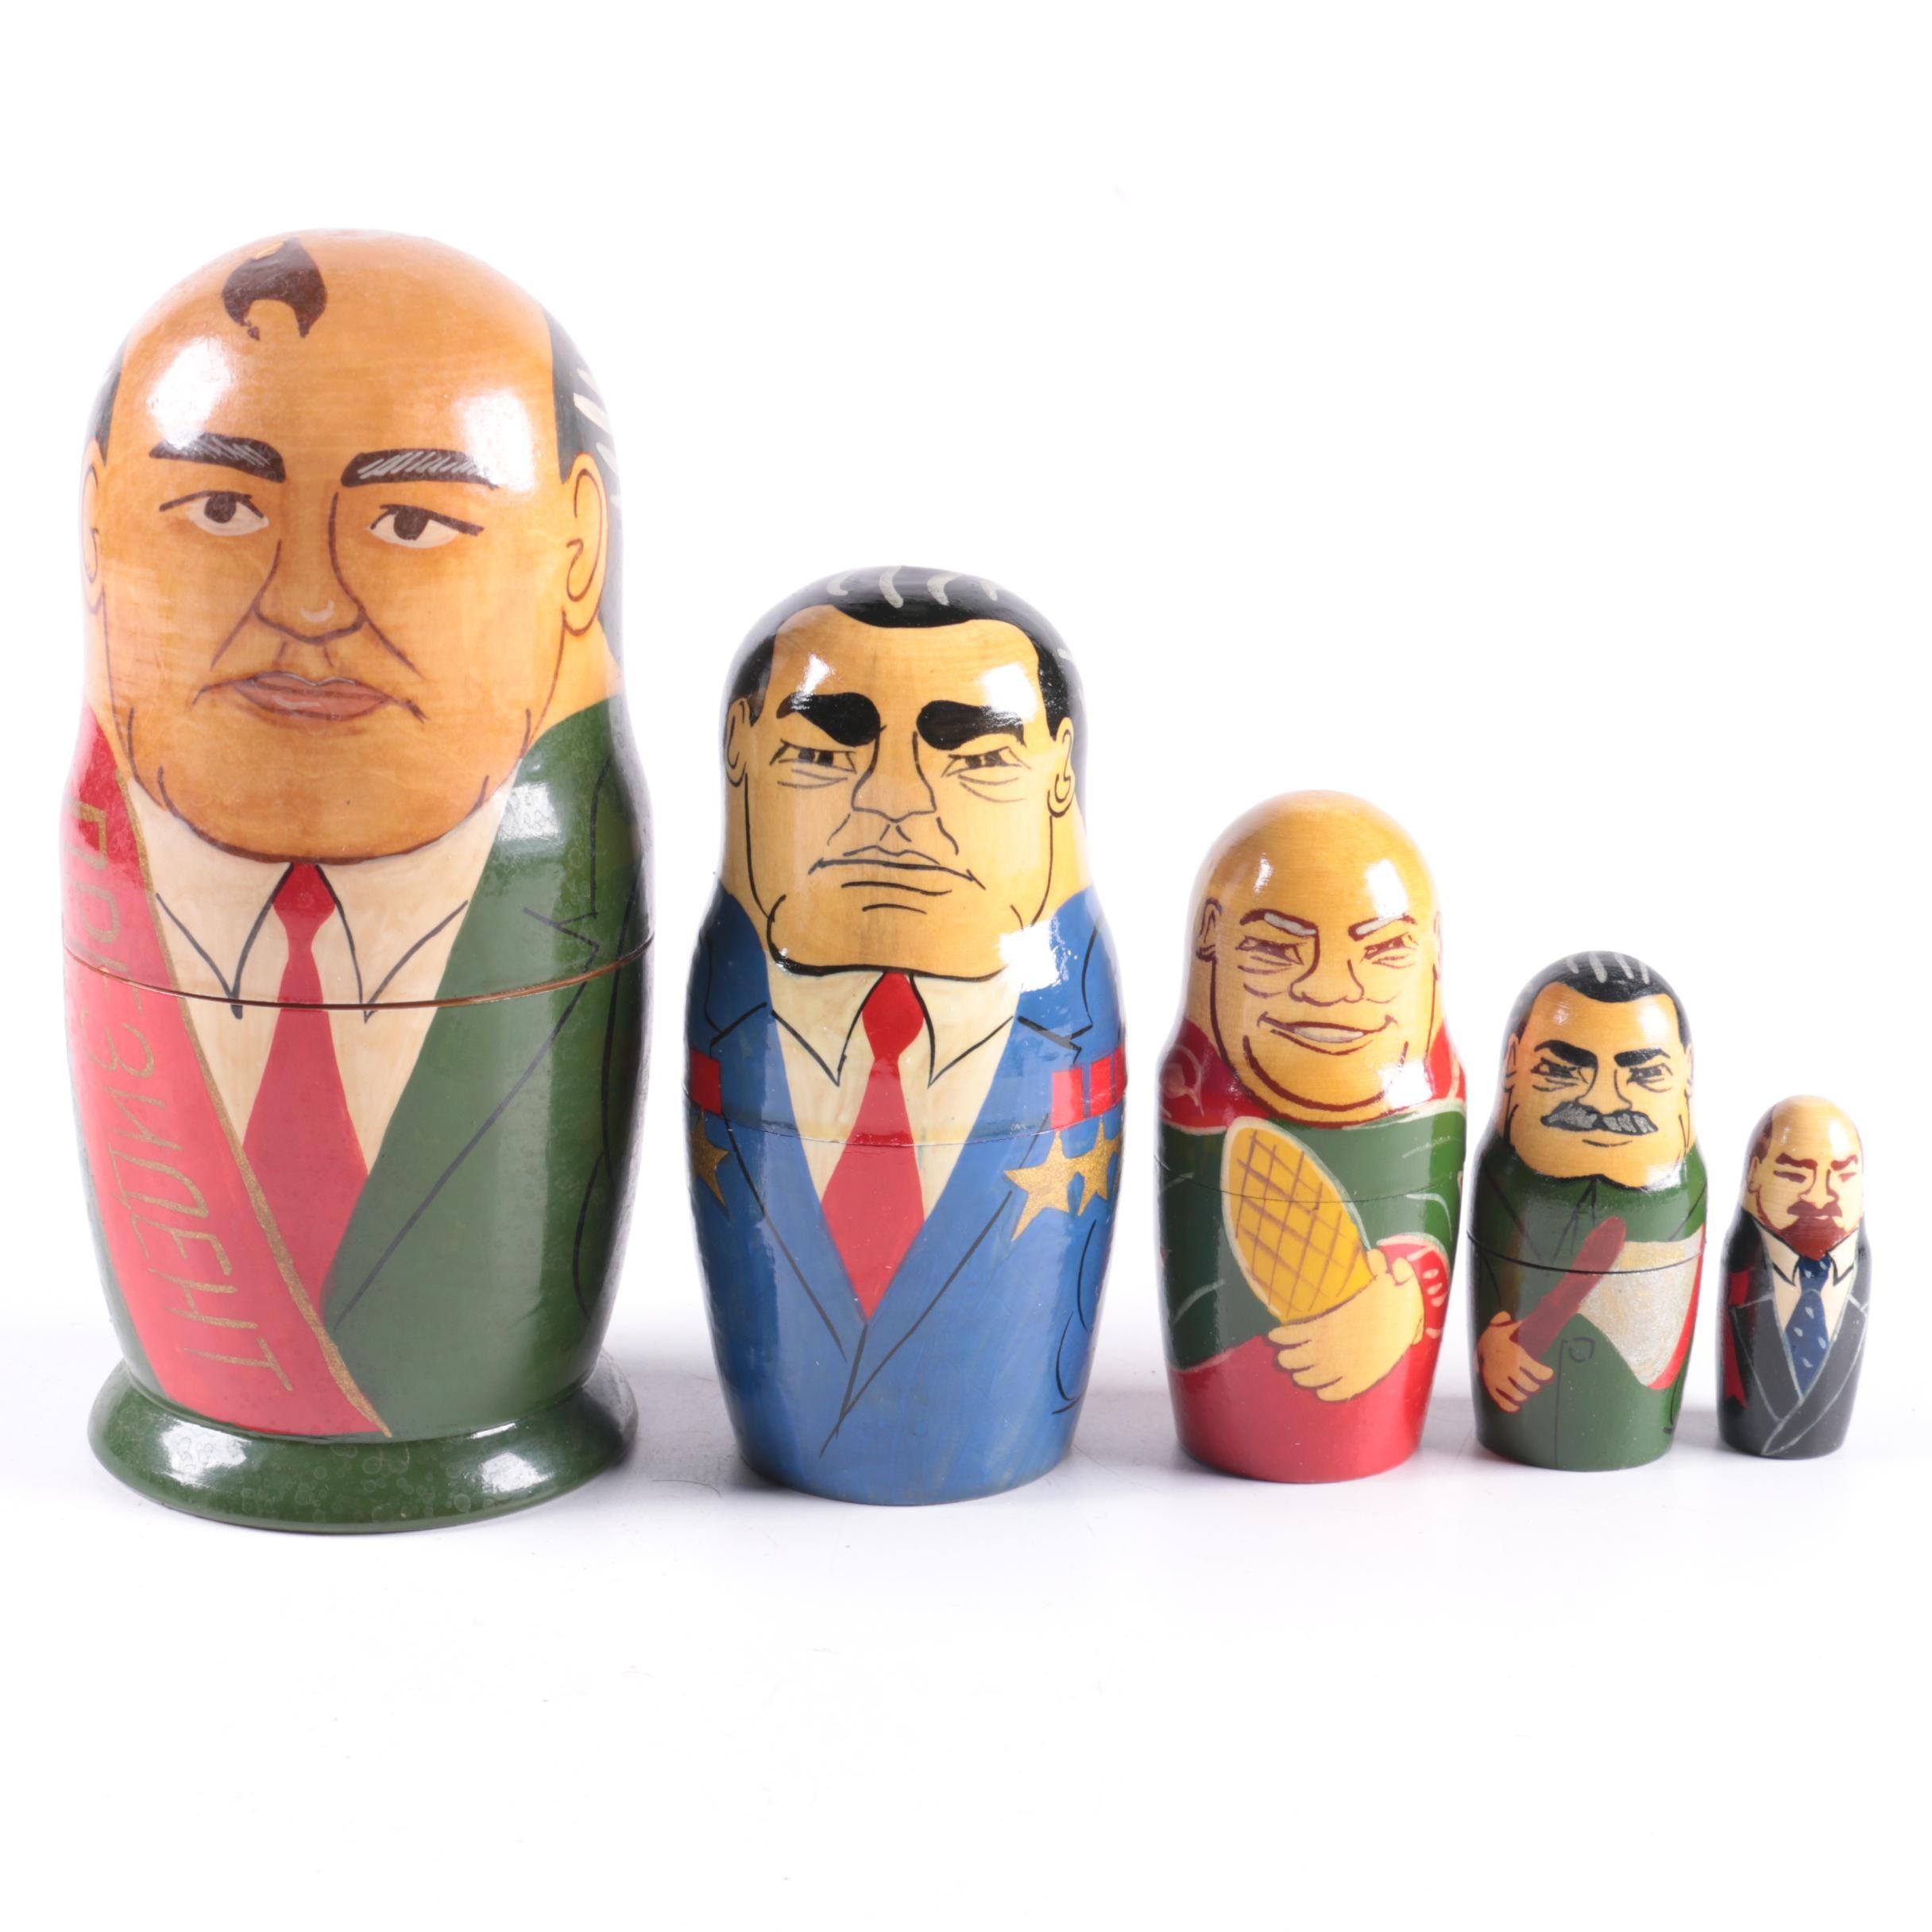 Matryoshka Nesting Doll of Russian Politicians